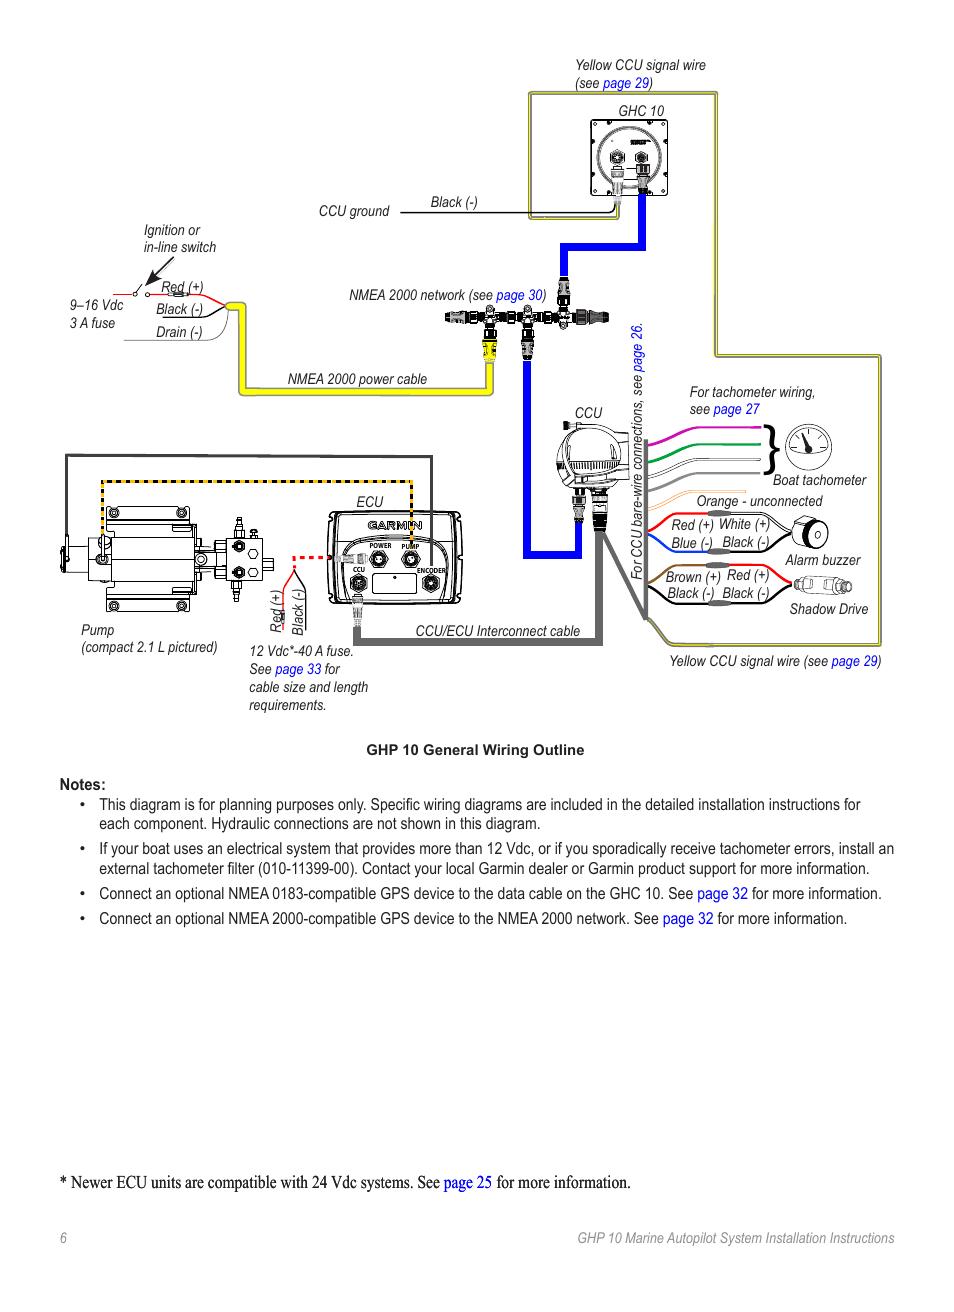 hight resolution of garmin nmea 0183 19 pin wiring diagram garmin gps wiring garmin nmea 0183 wiring diagram to simrad garmin chartplotter wiring diagram